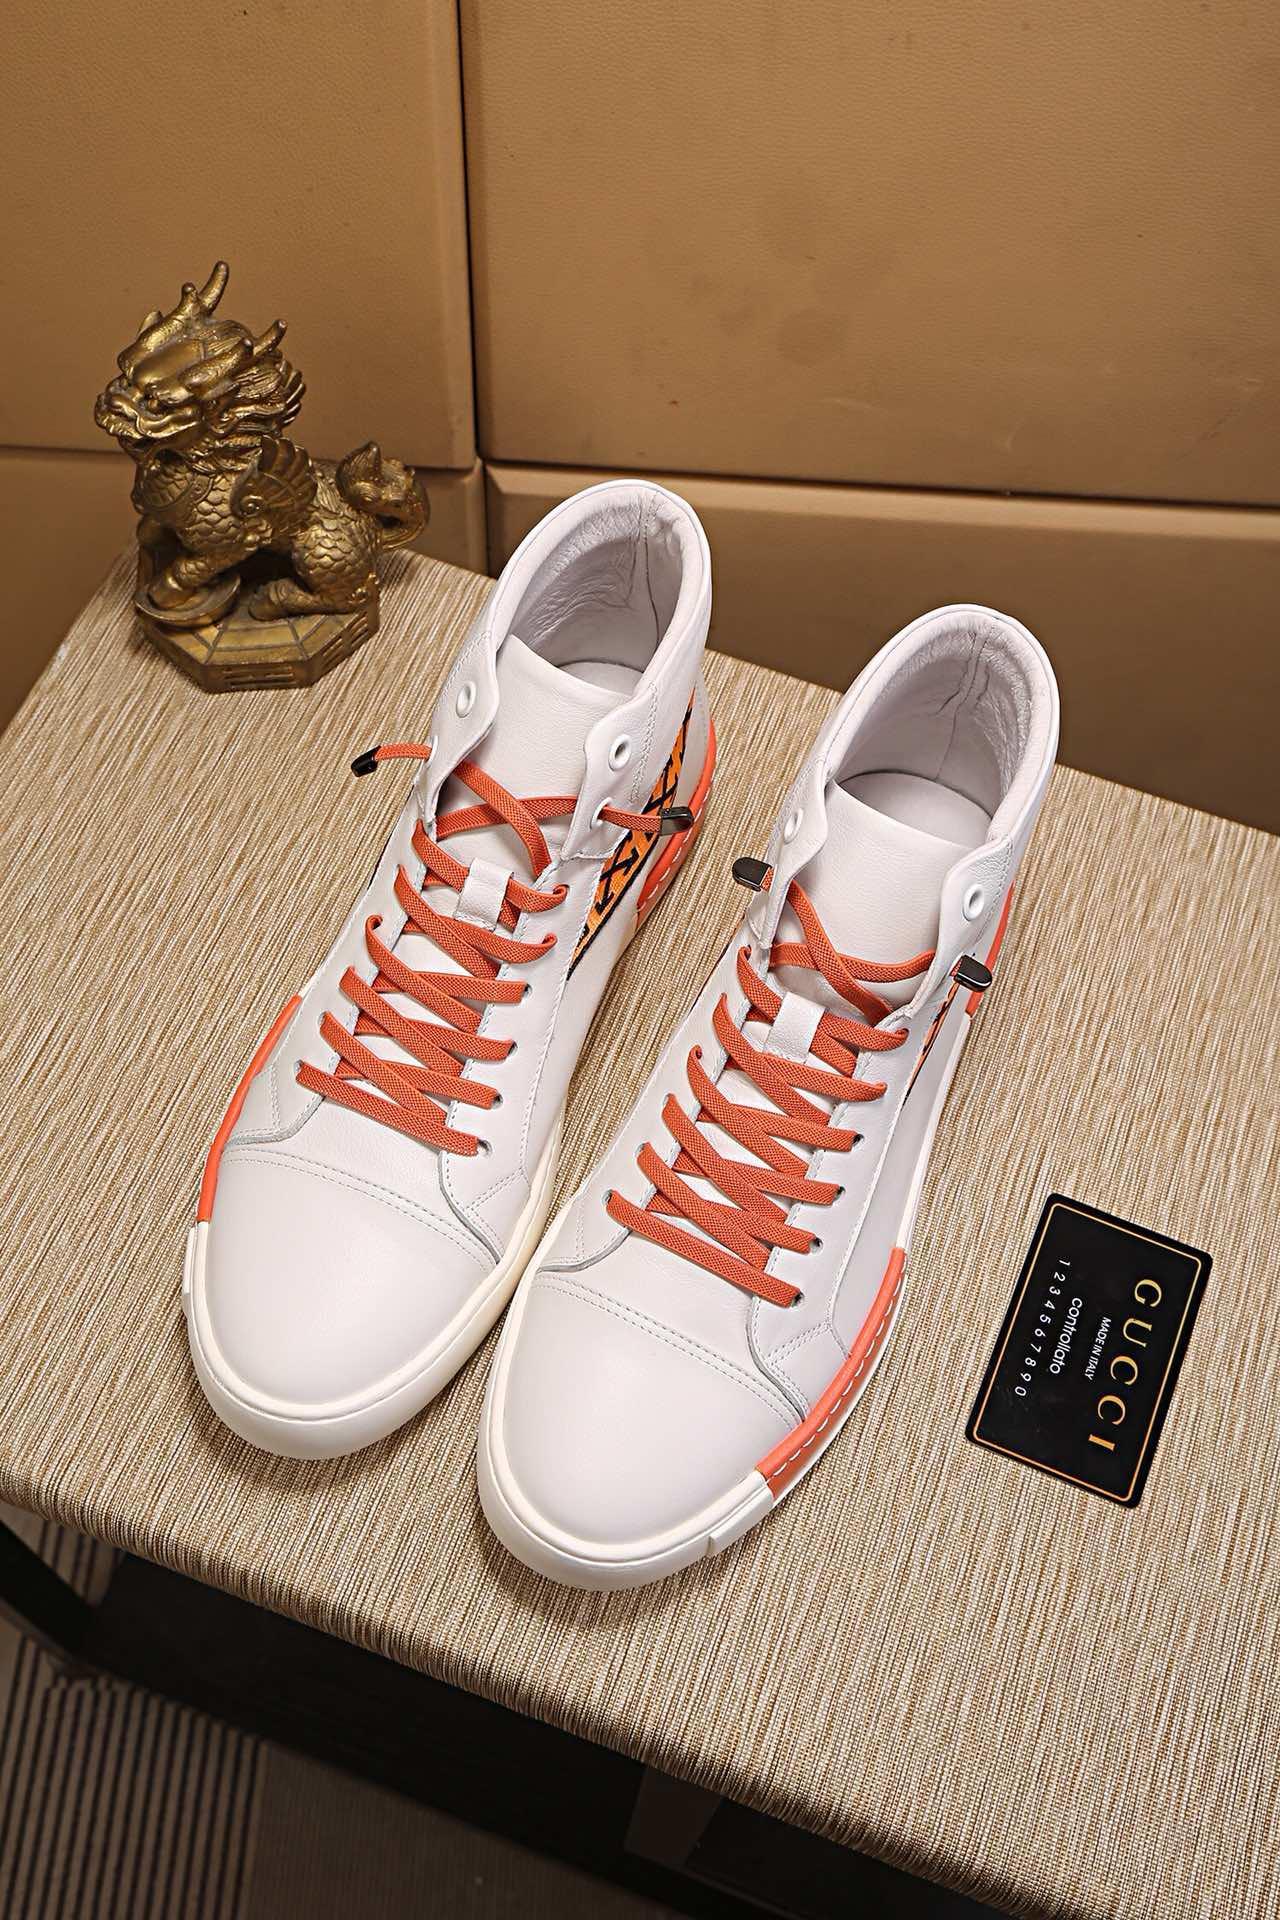 Gucci グッチ 靴 メンズ スーパーコピーブランド 最高級品